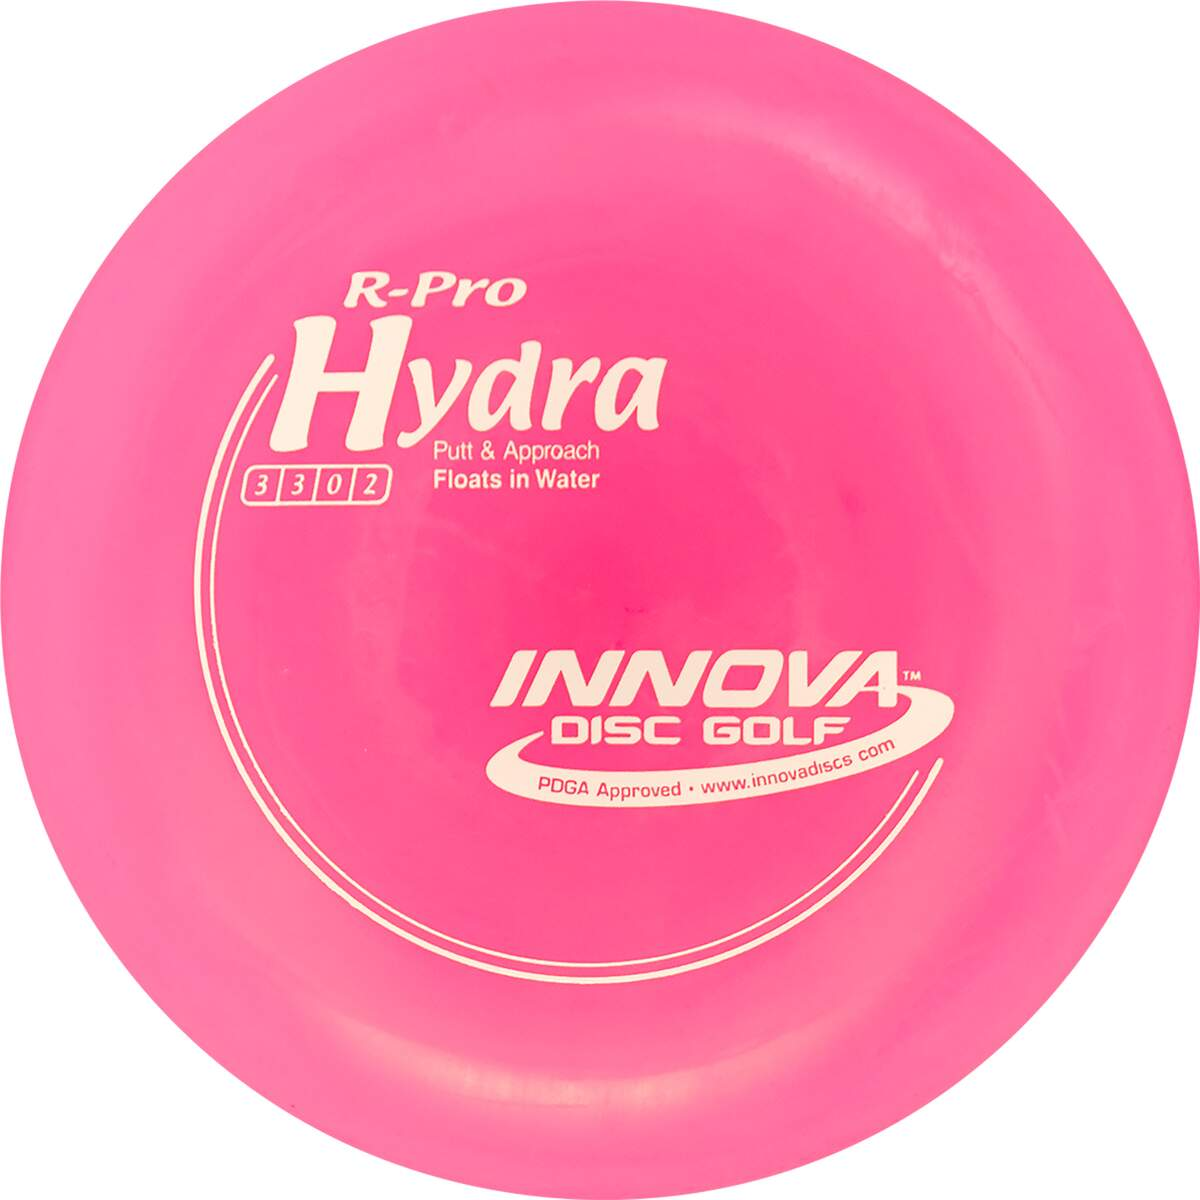 Innova  Pro Putter R-Pro Hydra 173-175g